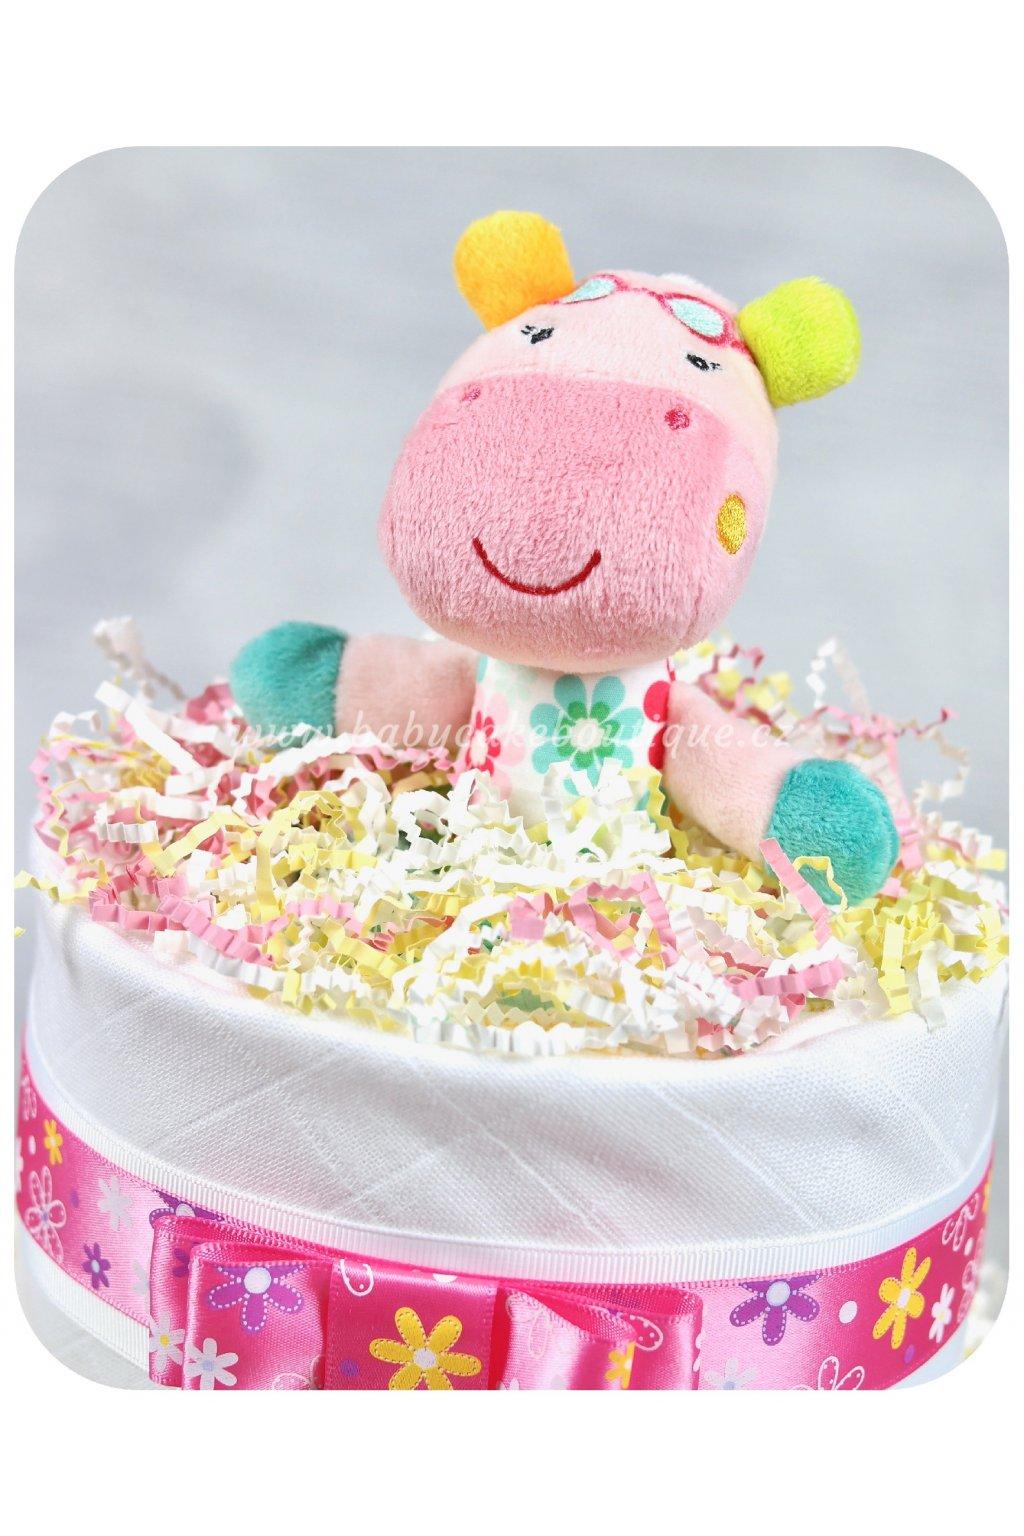 Dvoupatrový plenkový dort Tonička detail 1